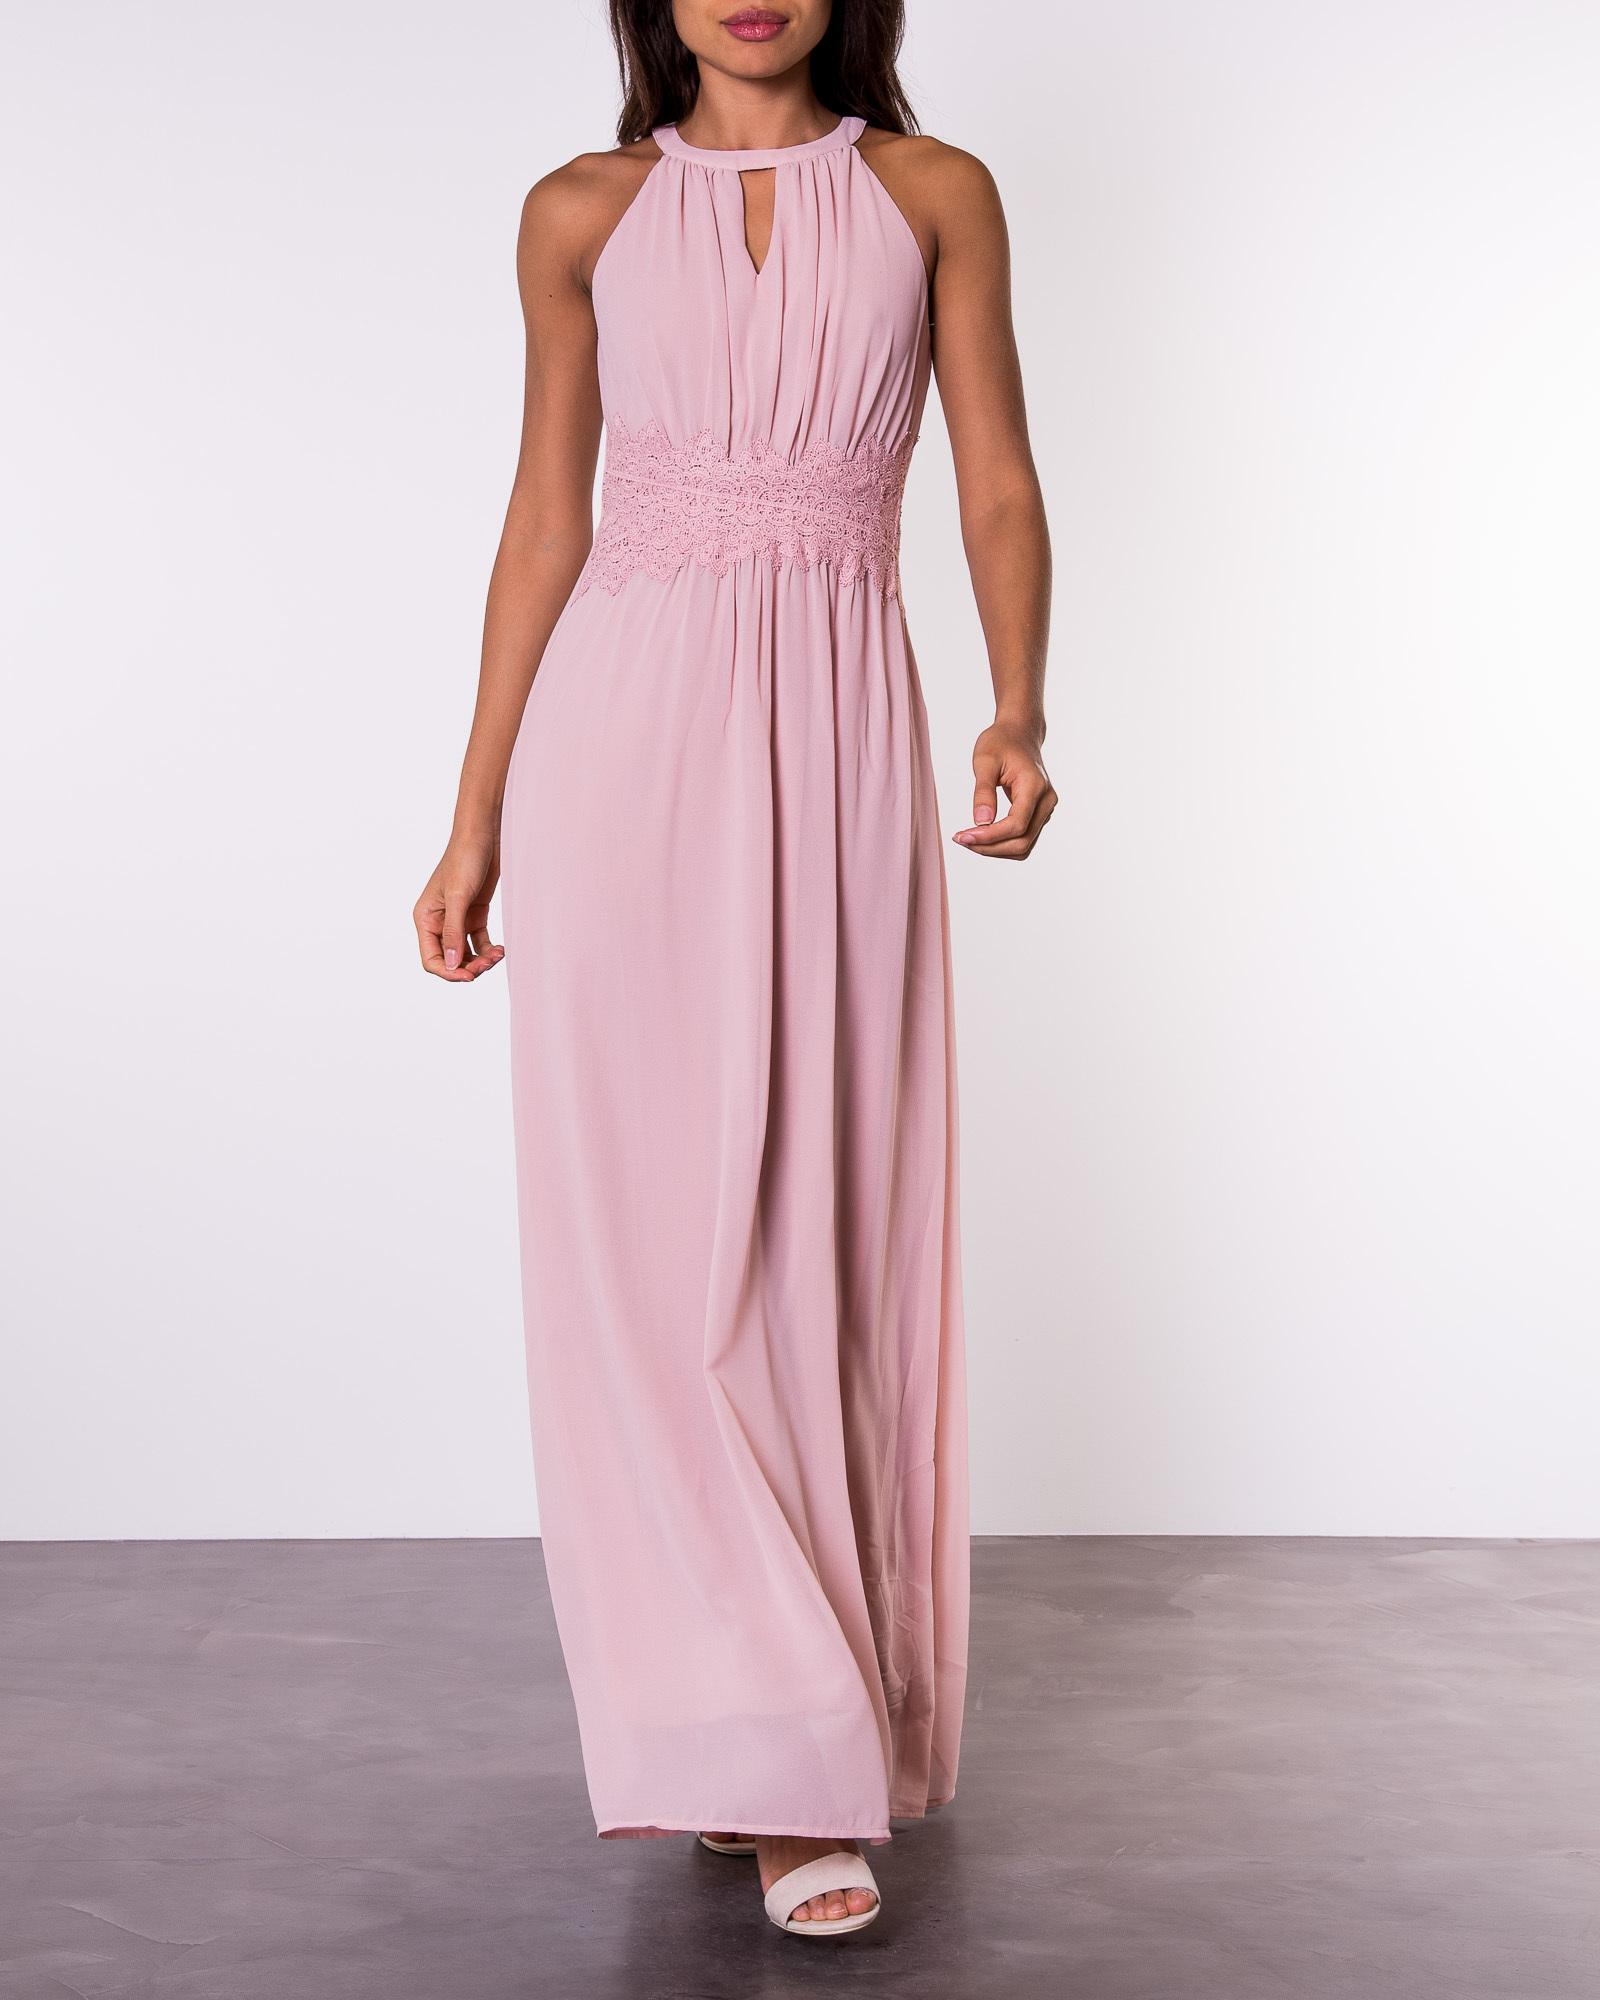 Osta naisten Pitka mekko Maksimekot koko EU 34 UK 6